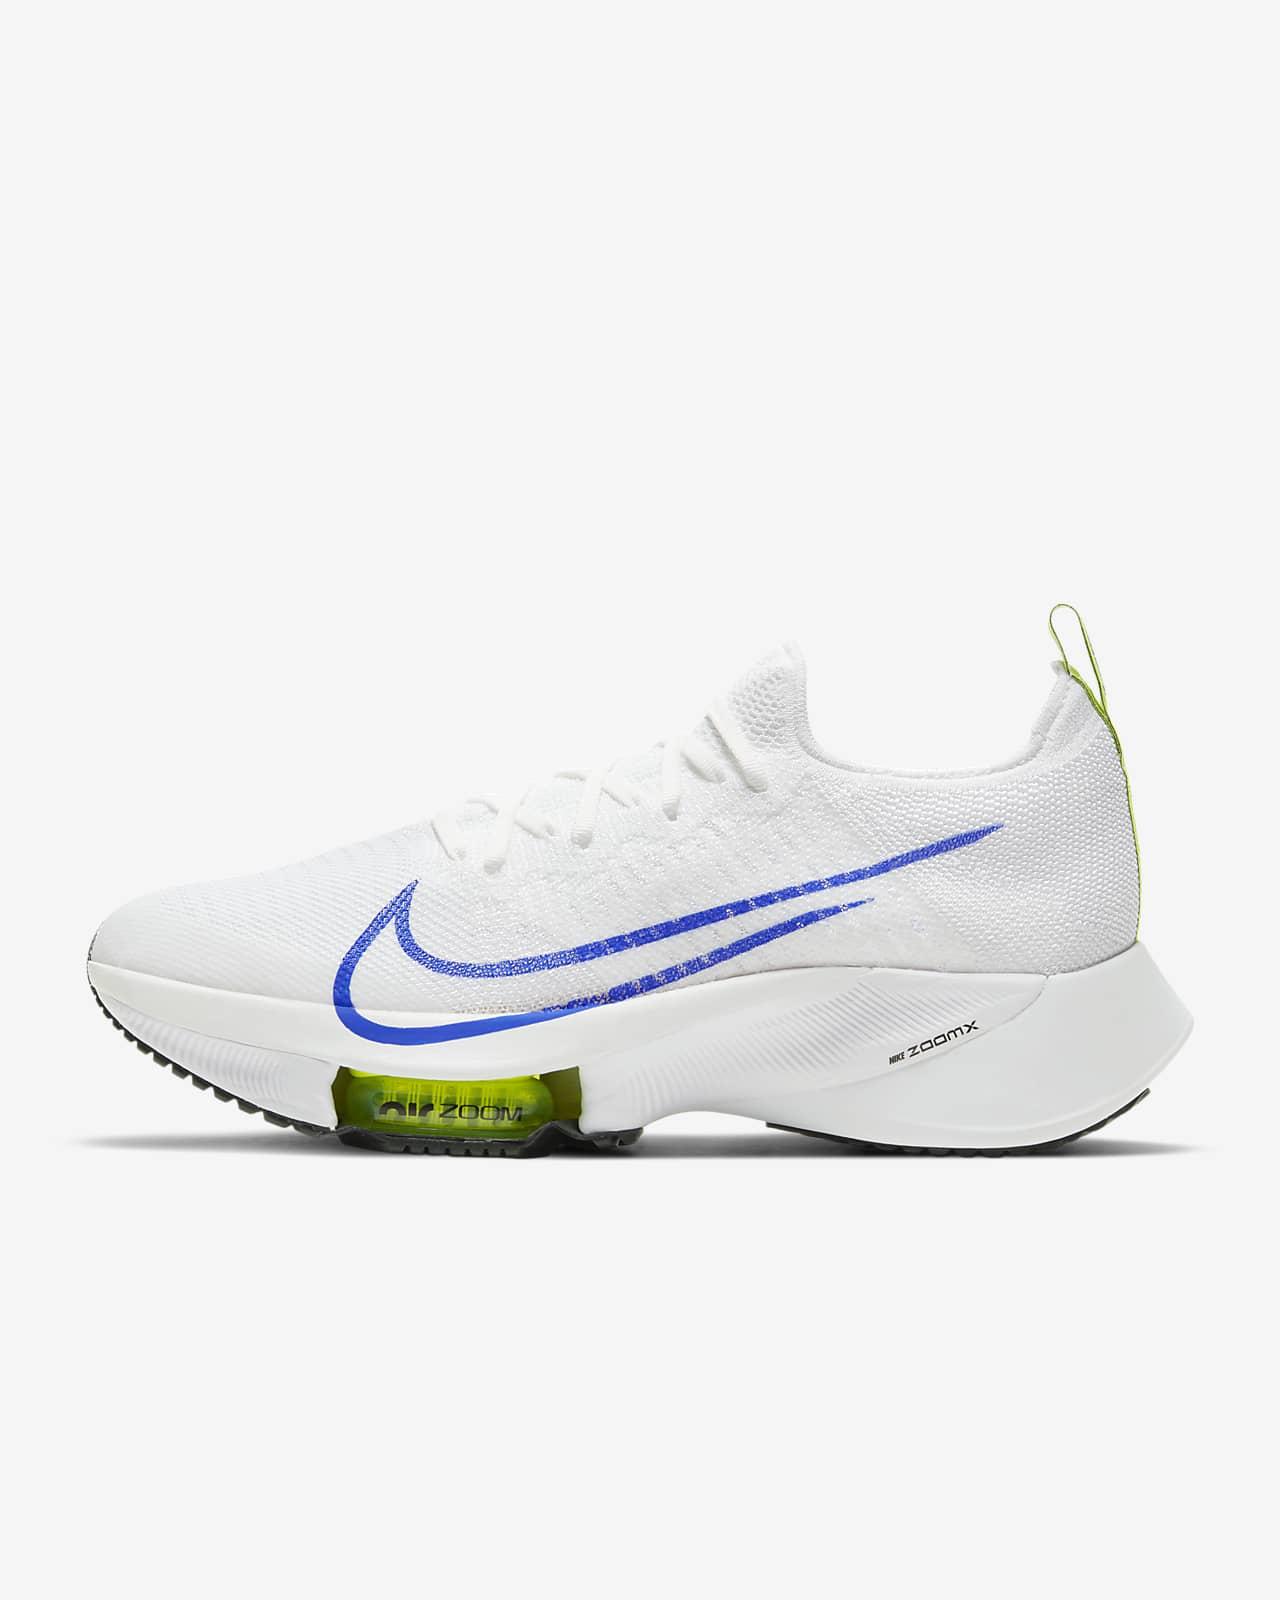 Nike Air Zoom Tempo NEXT% Herren-Laufschuh